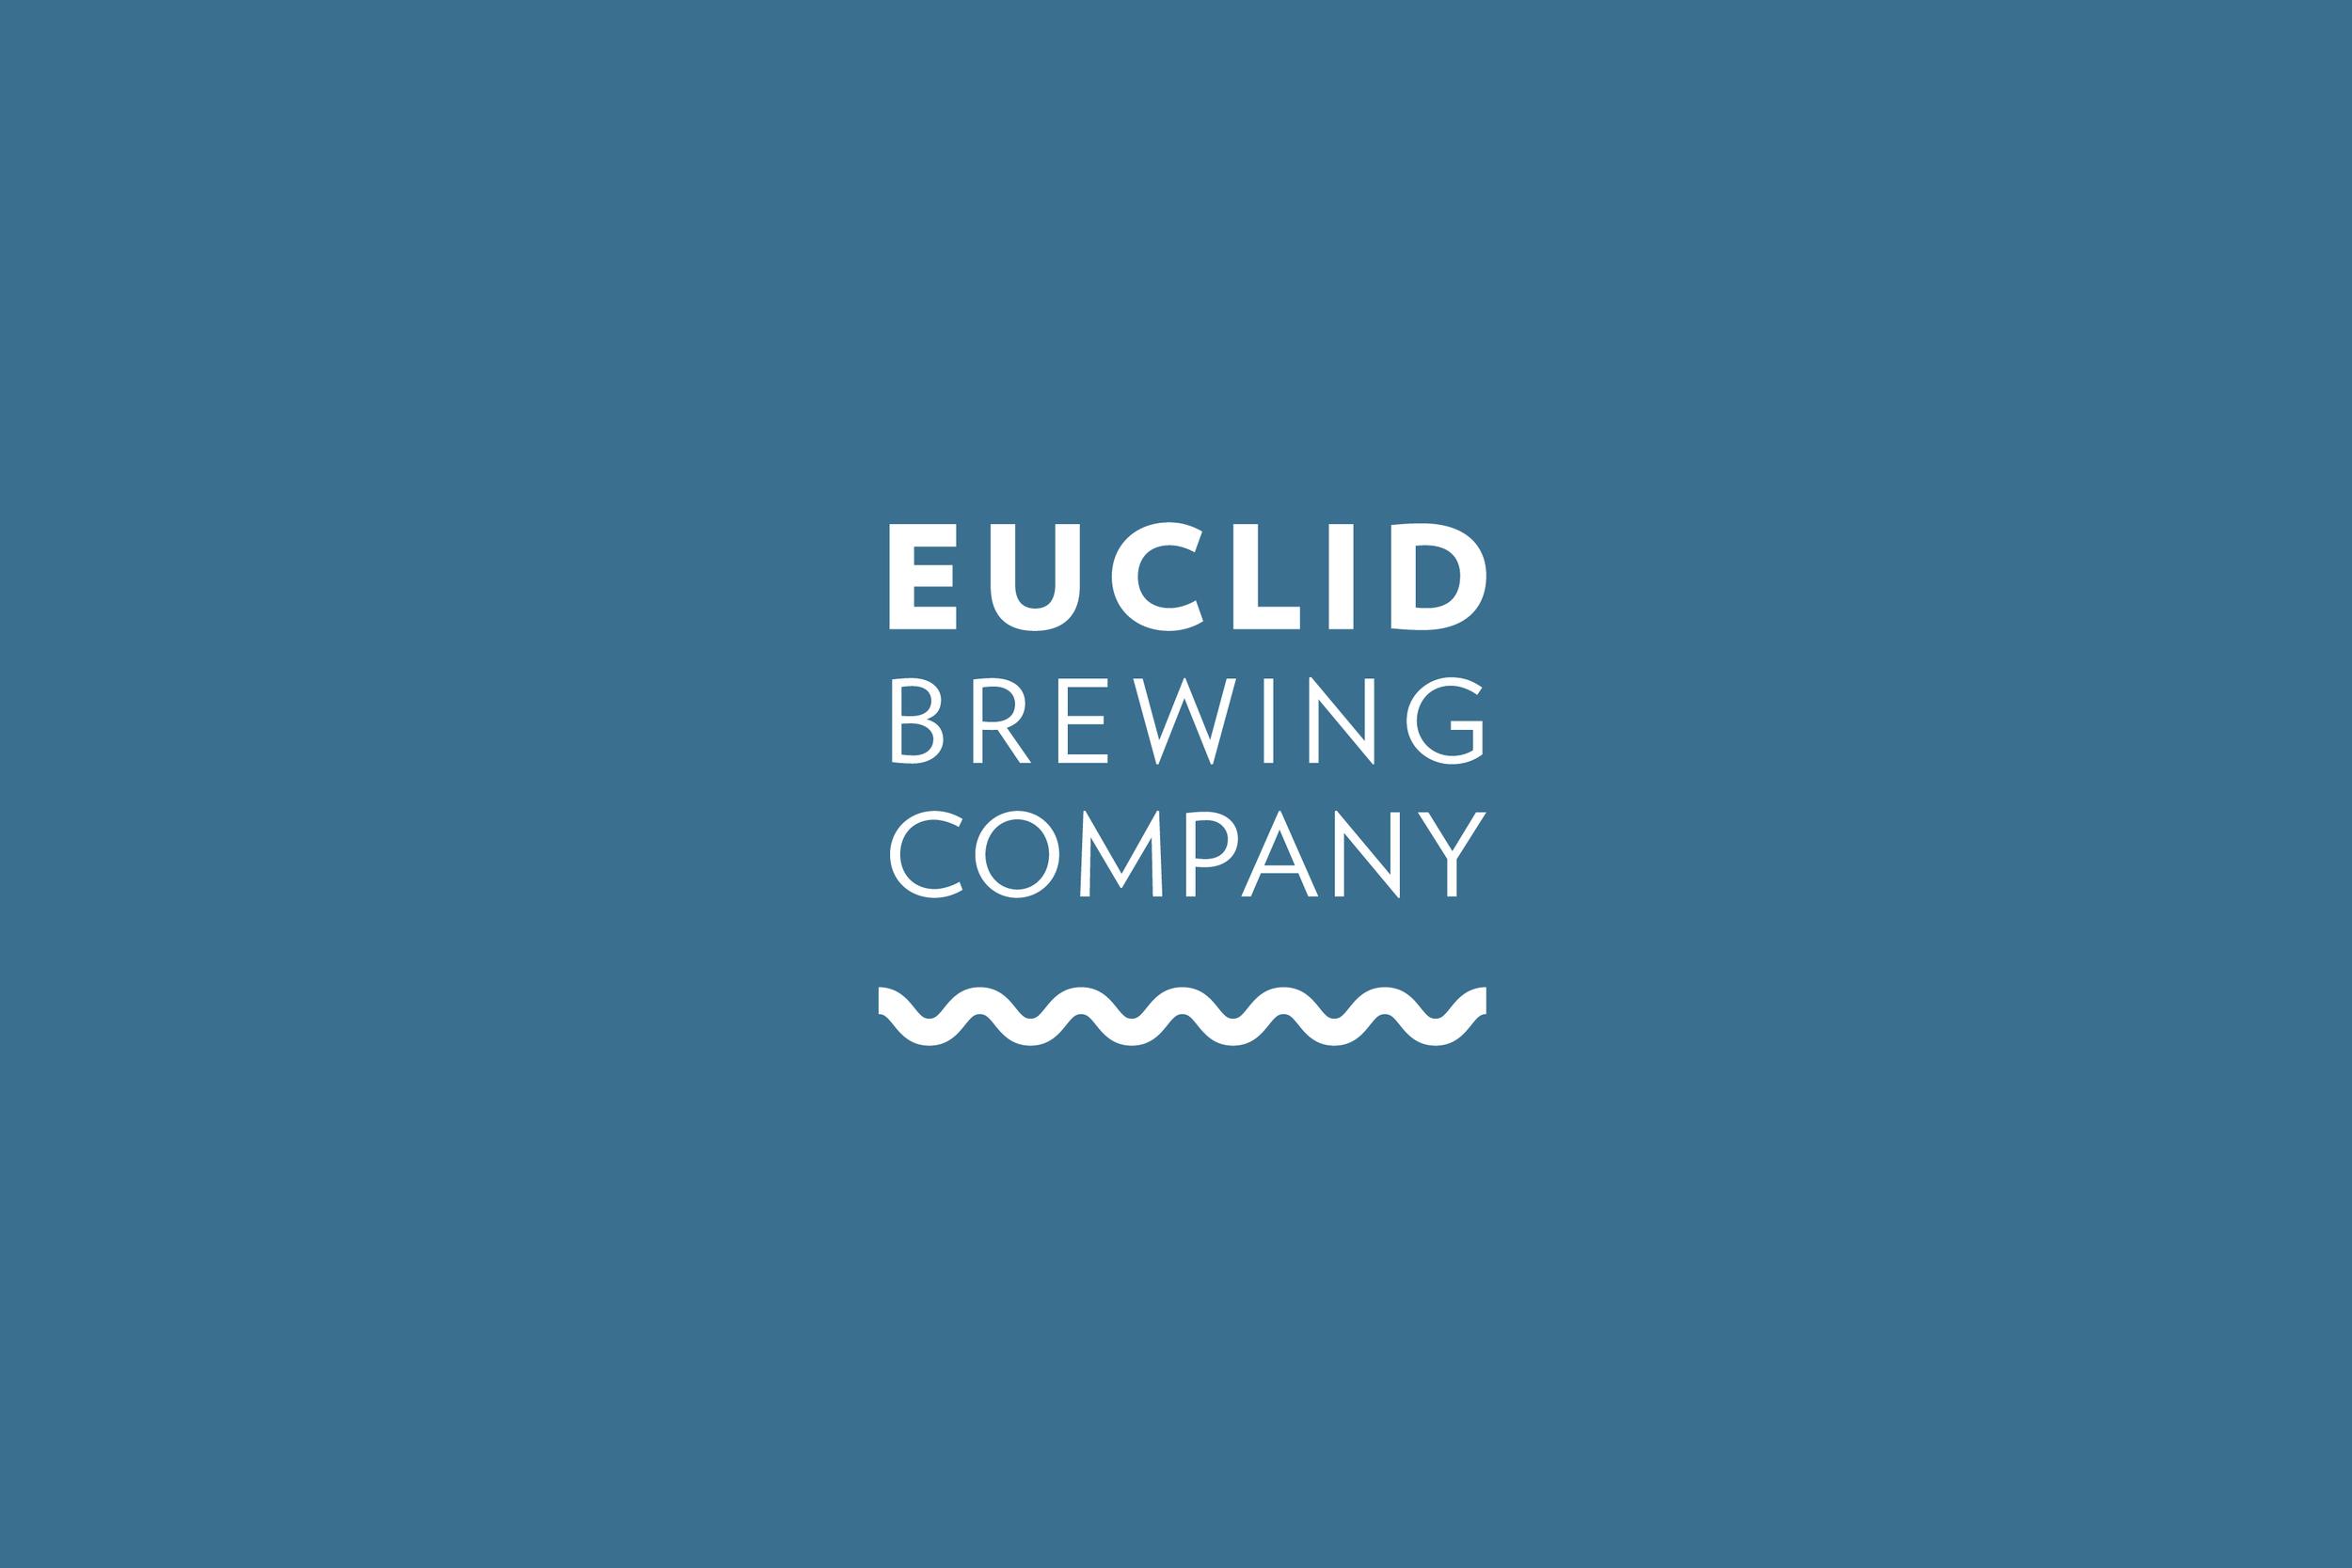 Agnes Studio Euclid Brewing branding